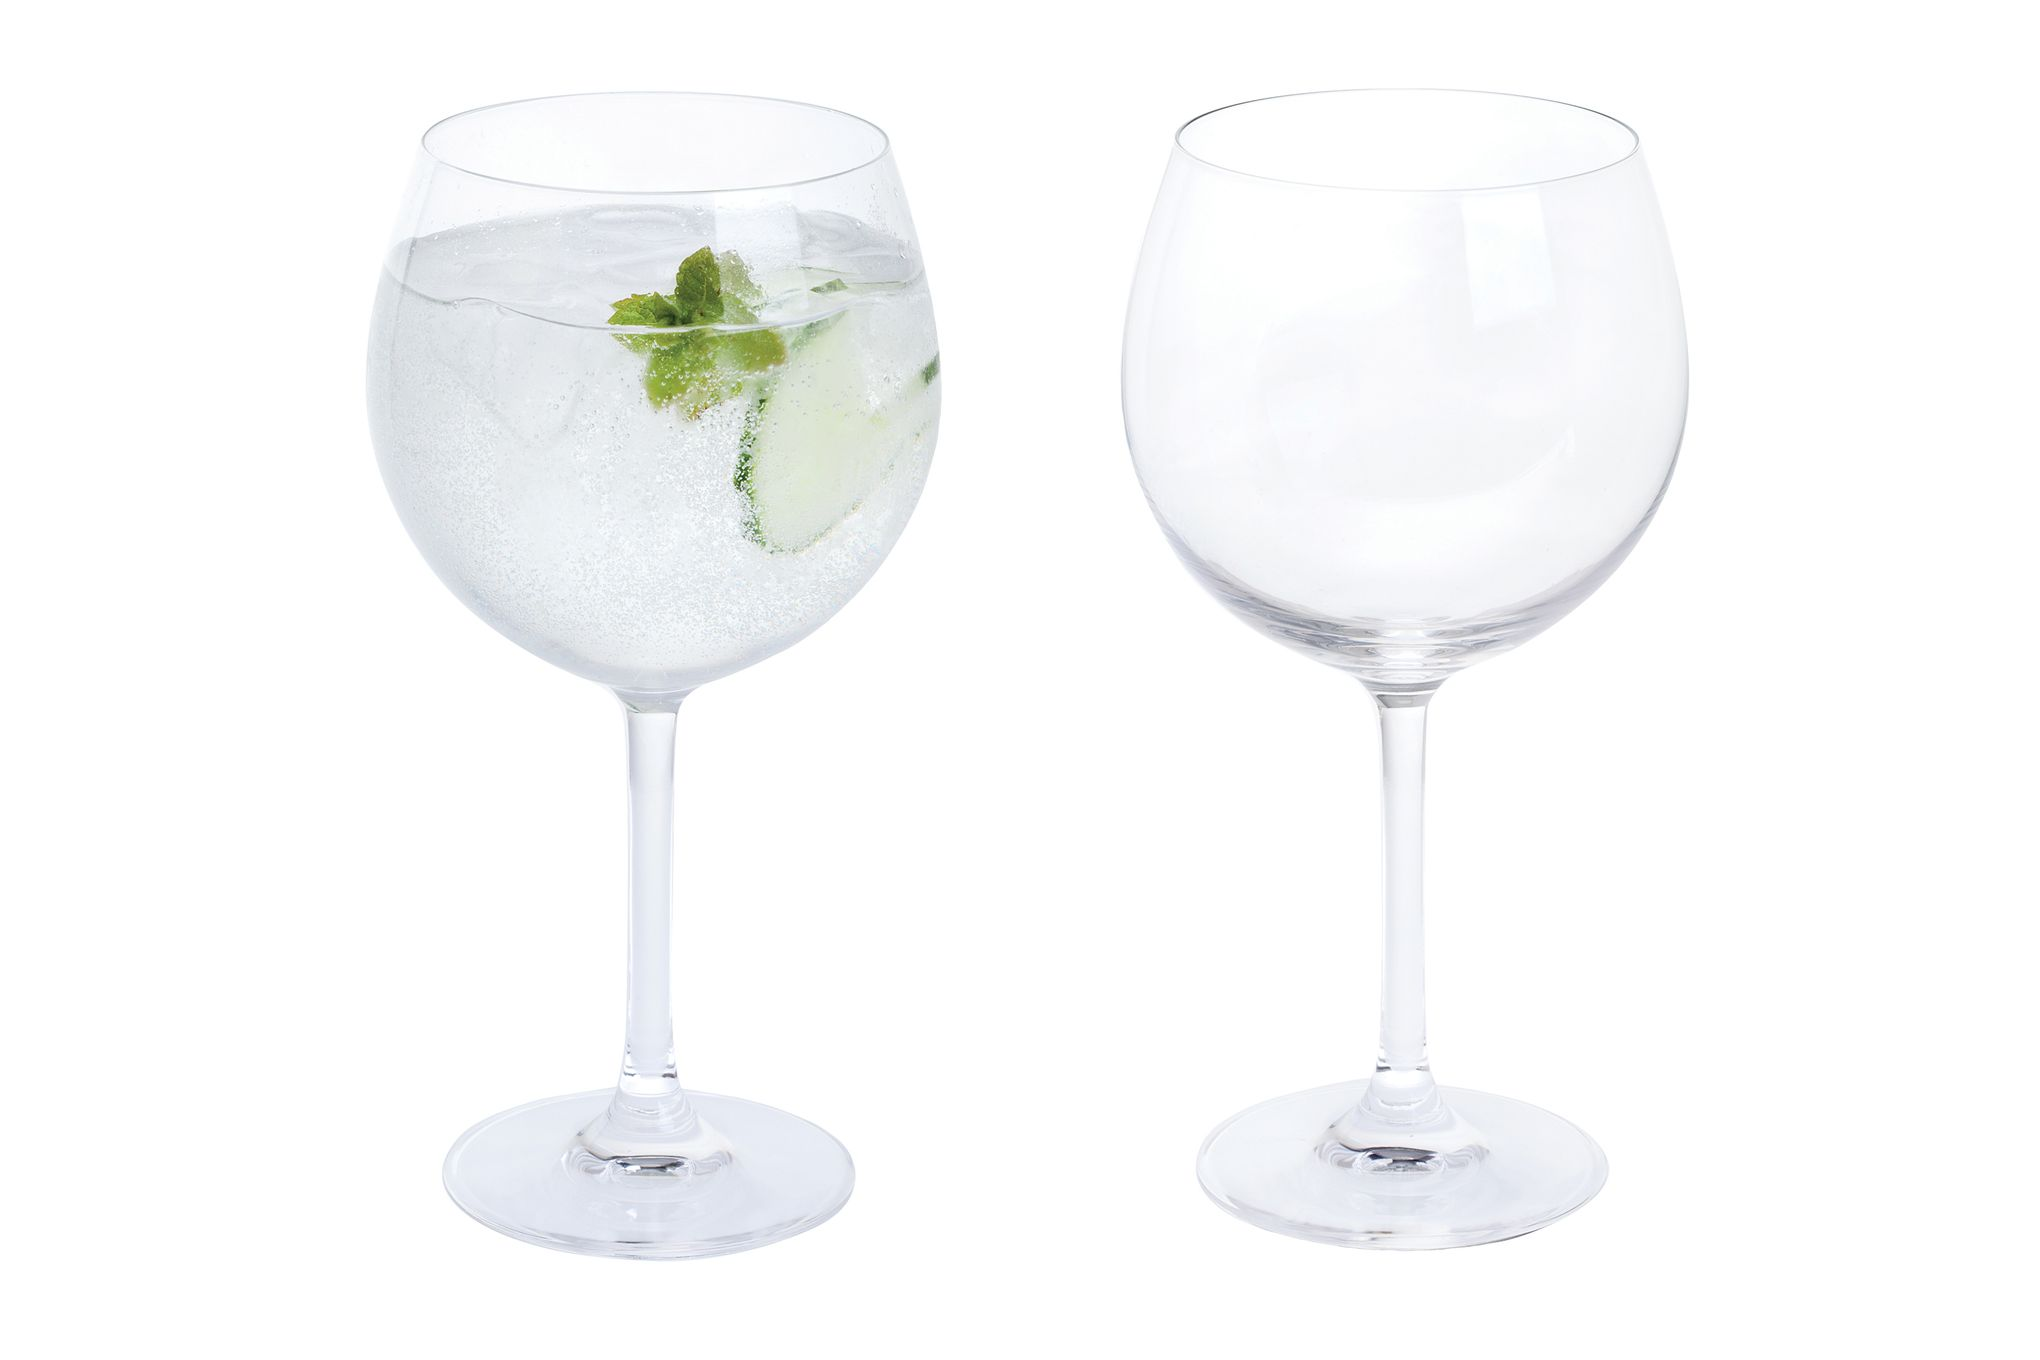 Dartington Crystal Wine & Bar Pair of Gin Glasses 650ml thumb 1